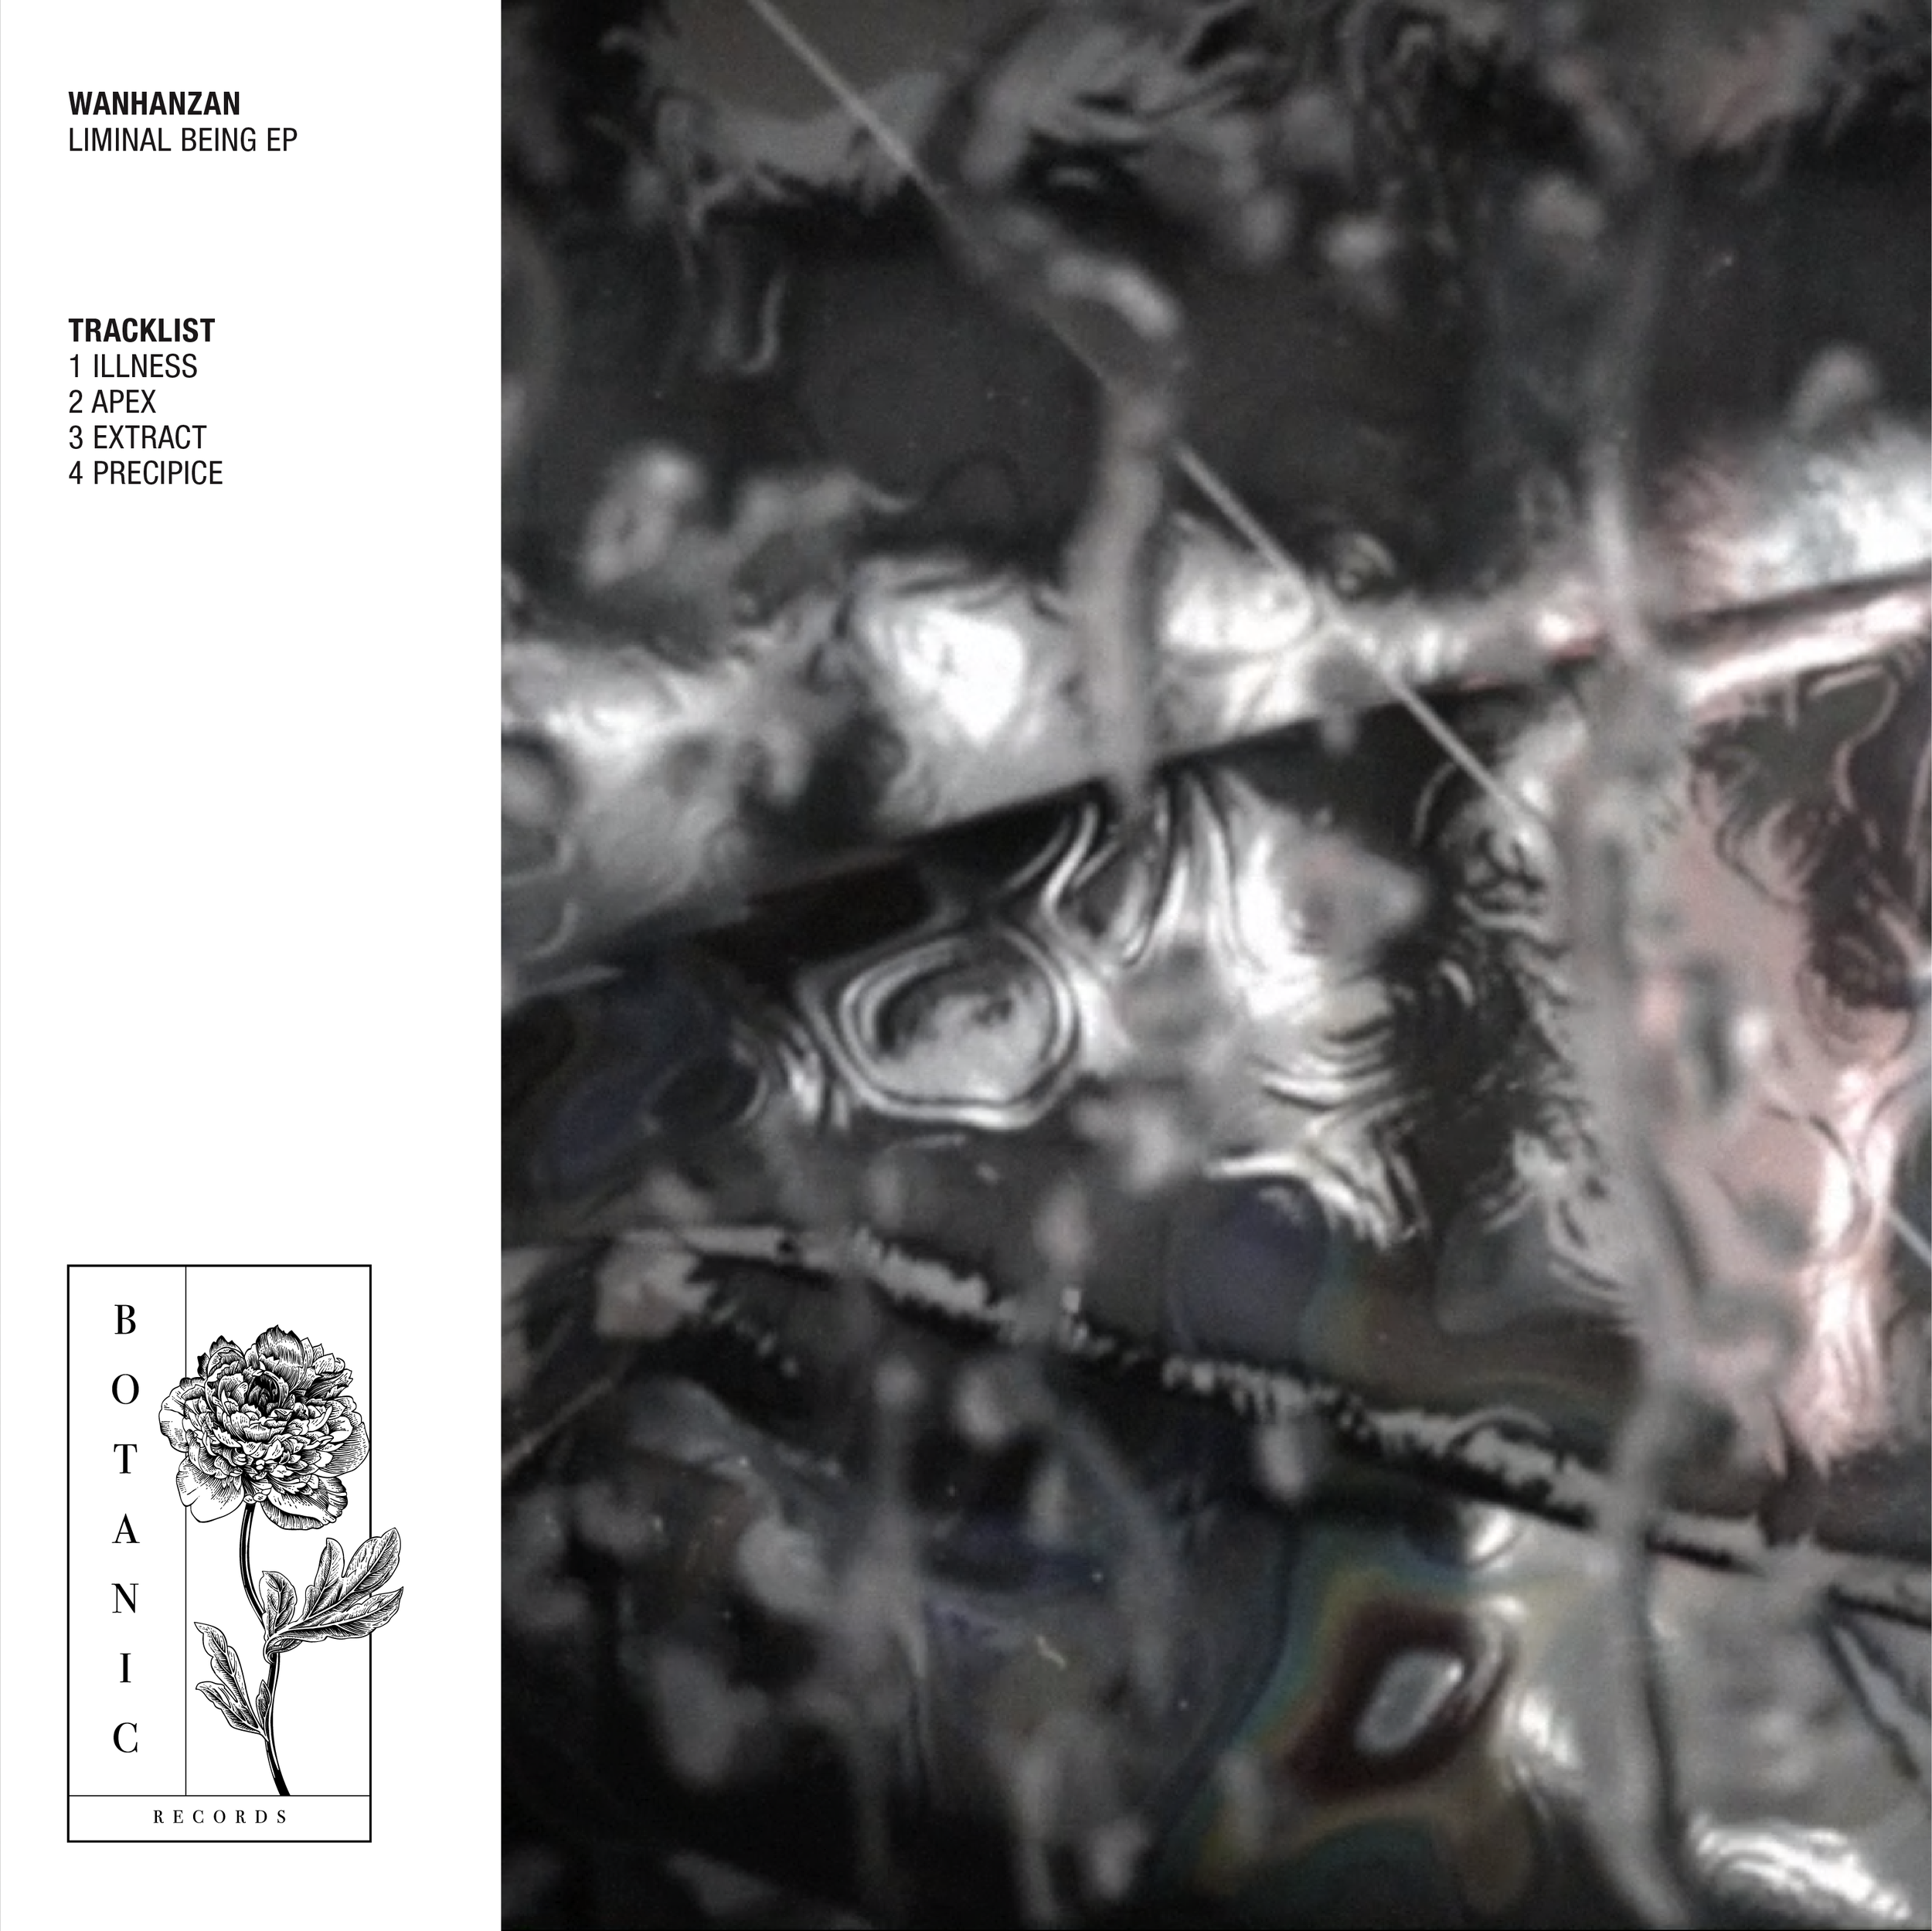 BOT007 Wanhanzan - Liminal Being EP Cover.png